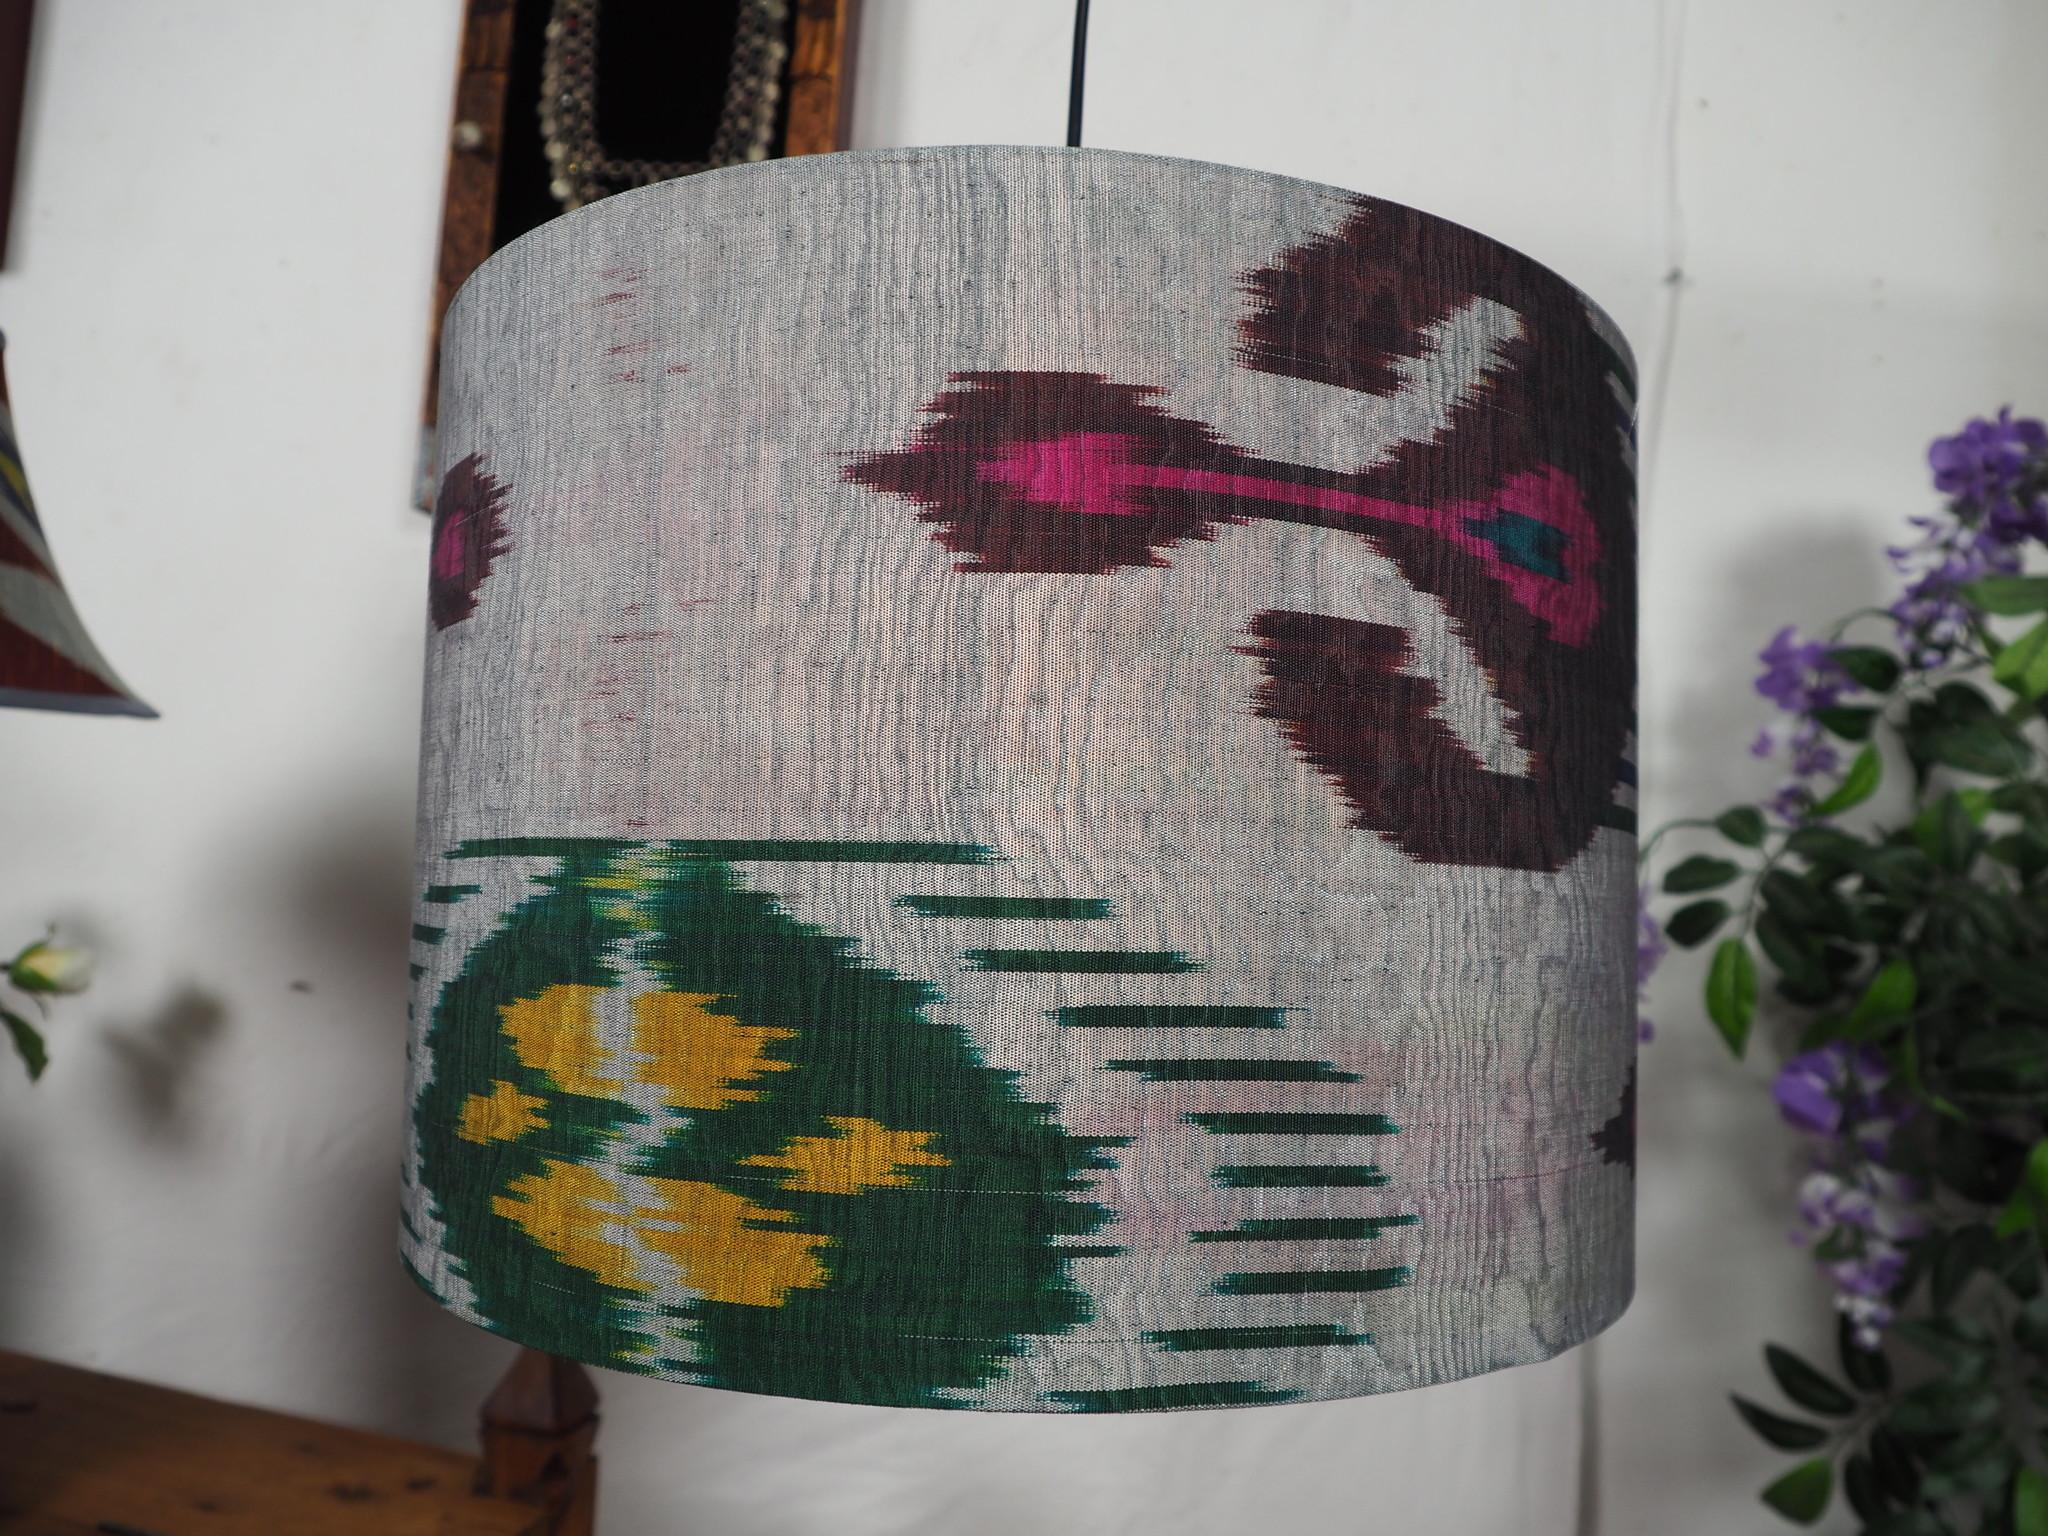 orient Uzbek Ikat stoff Schirm Lampenschirm lampshade Nr: M